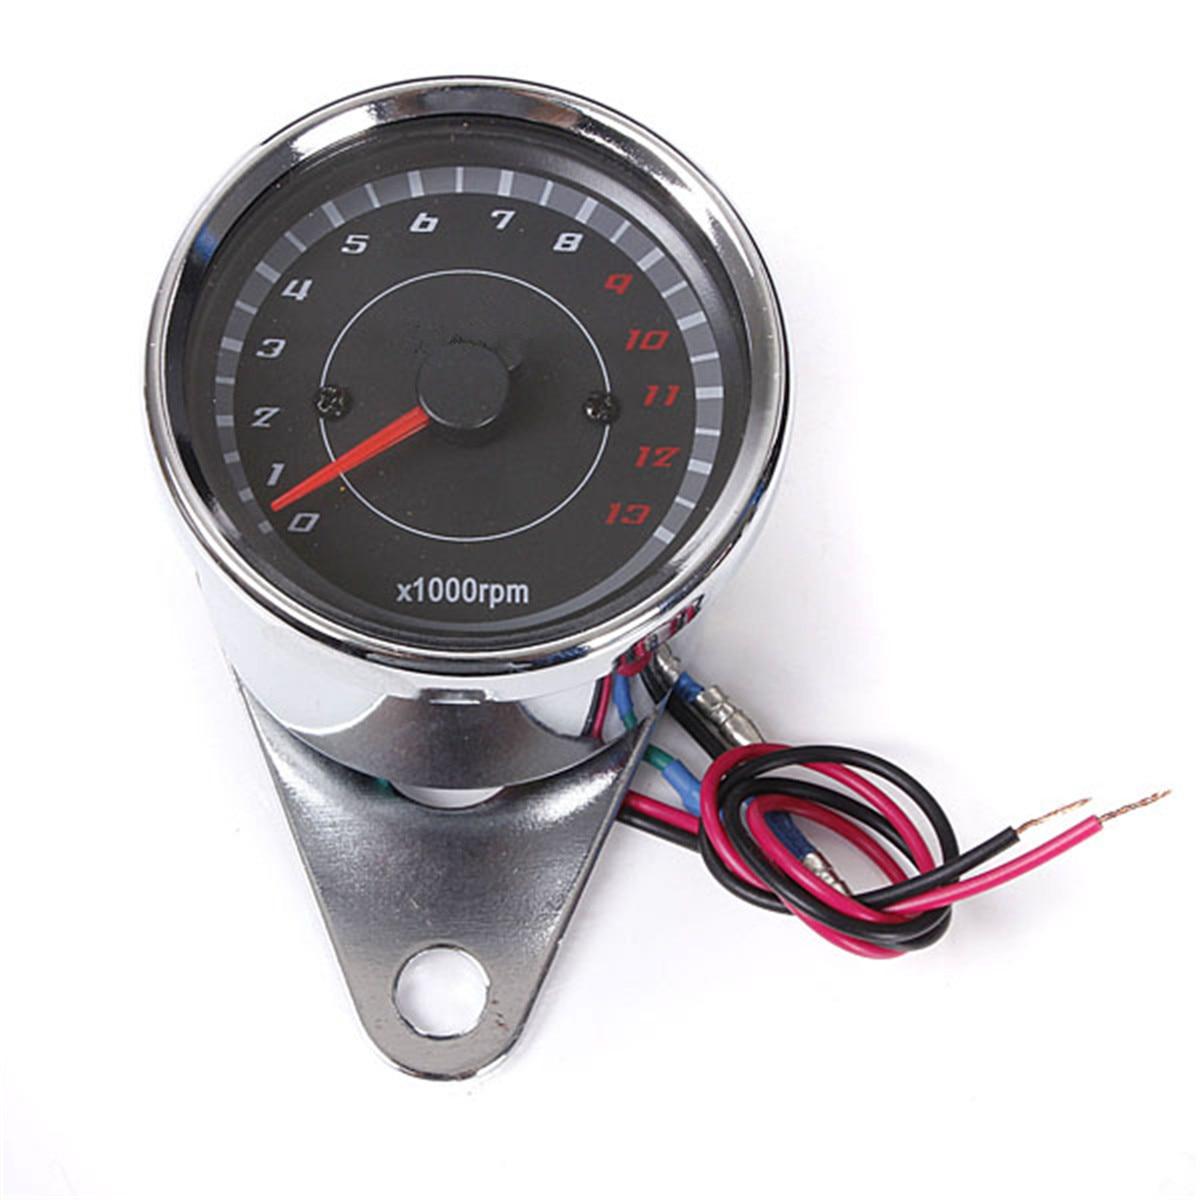 12 v 60mm 실버 오토바이 속도계 타코미터 주행 거리계 rev 카운터 0-13000 rpm